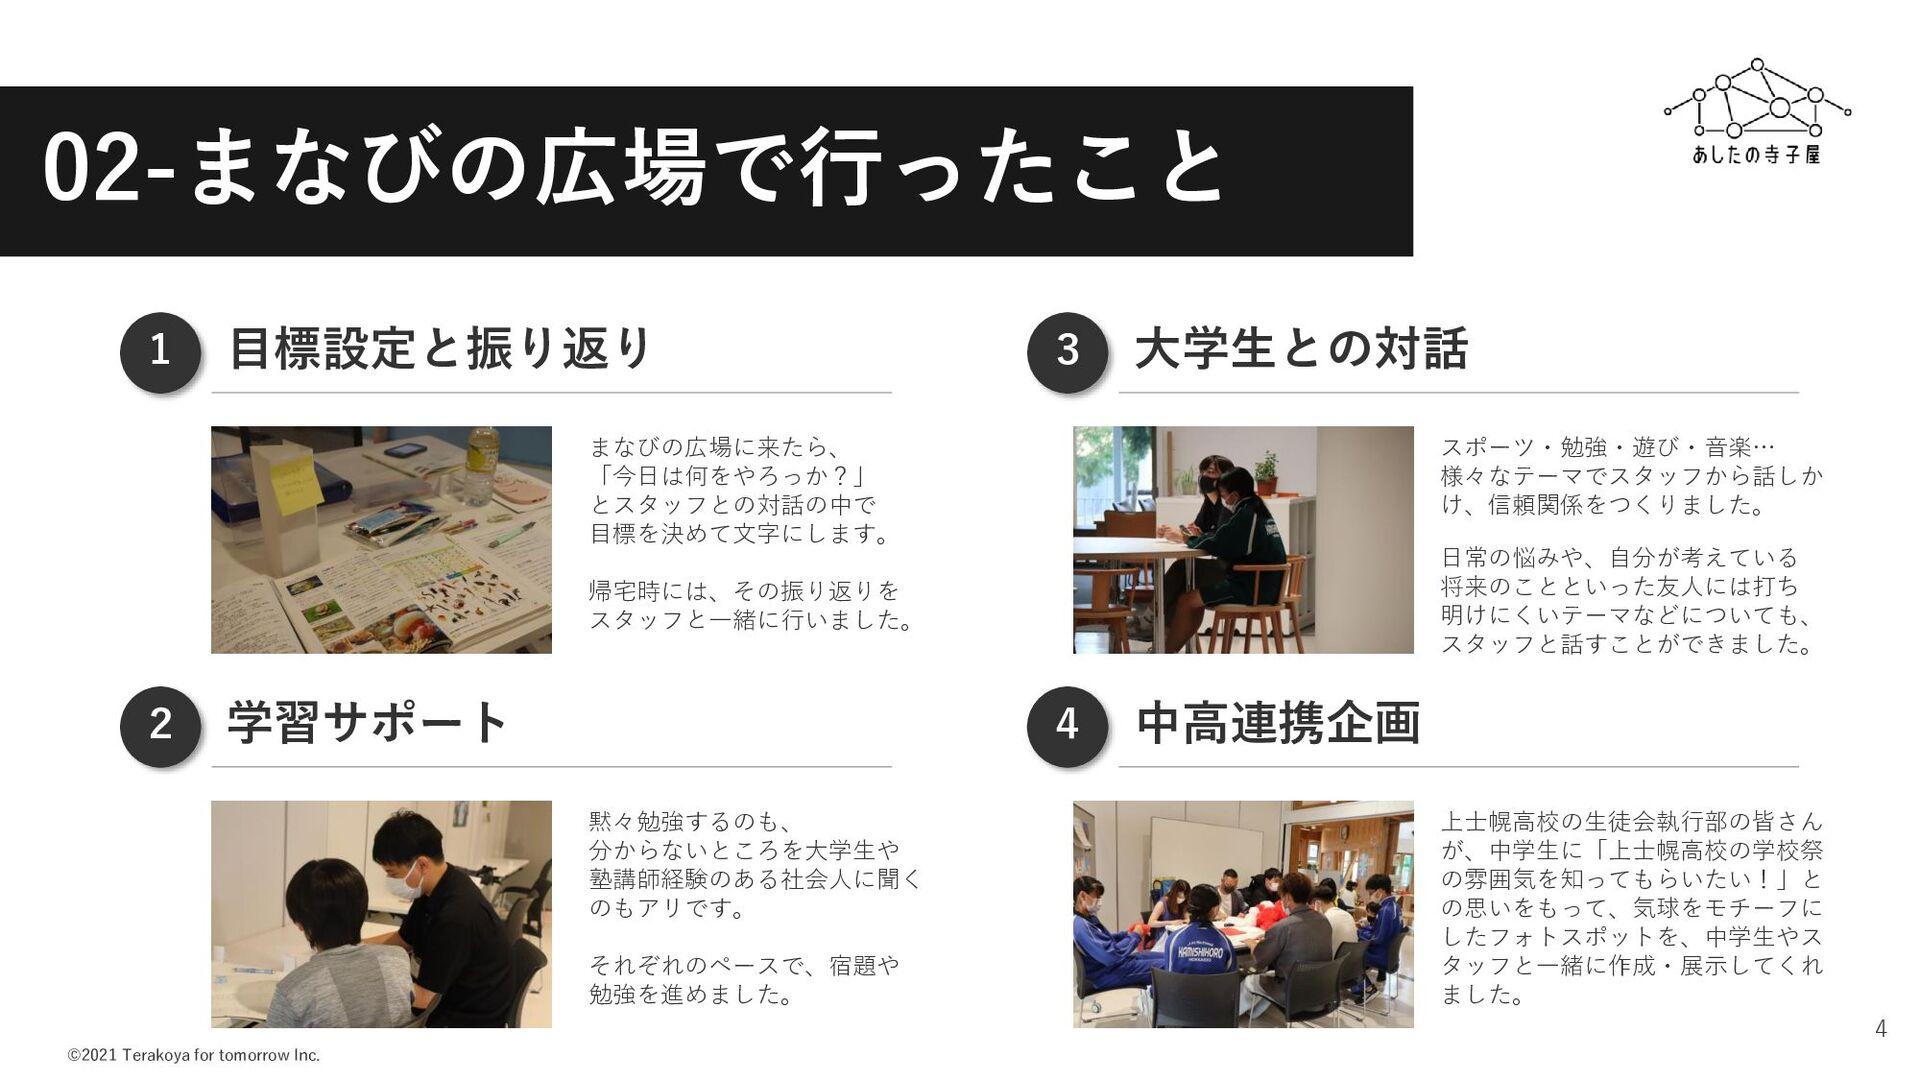 ©2021 Terakoya for tomorrow Inc. 4 02-まなびの広場で行っ...